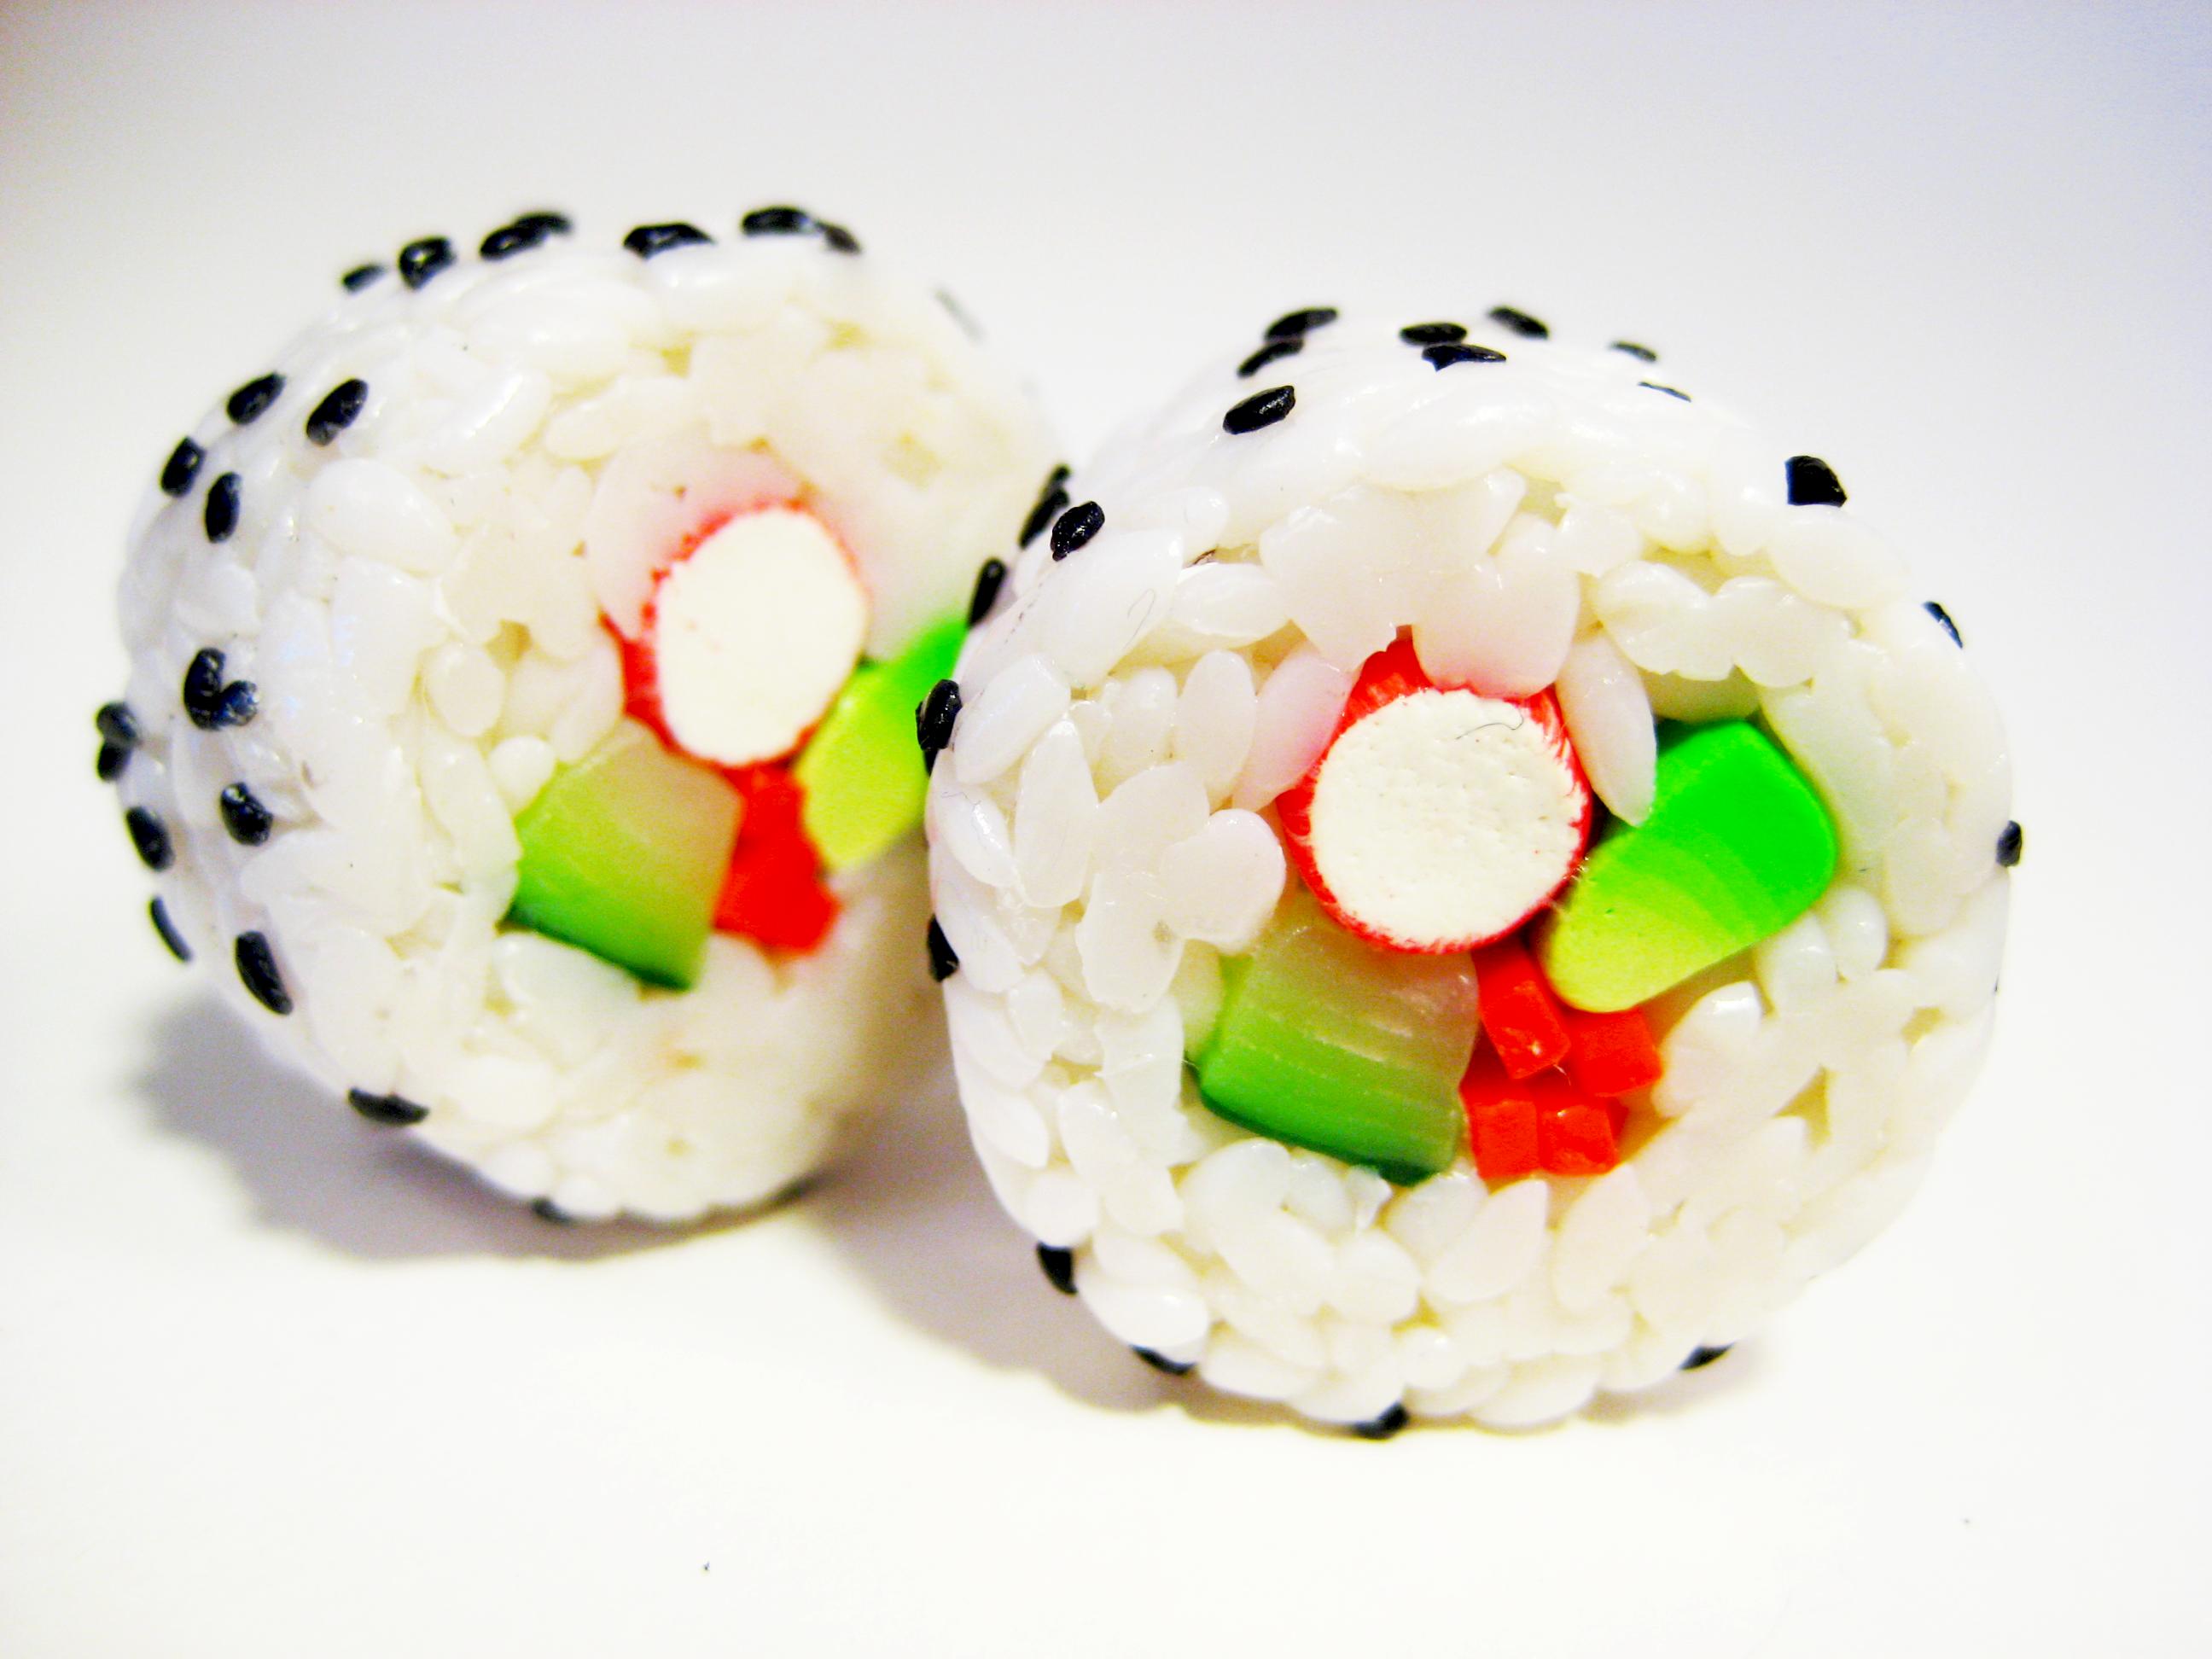 Sushi Rolls 1 Png 2592 1944